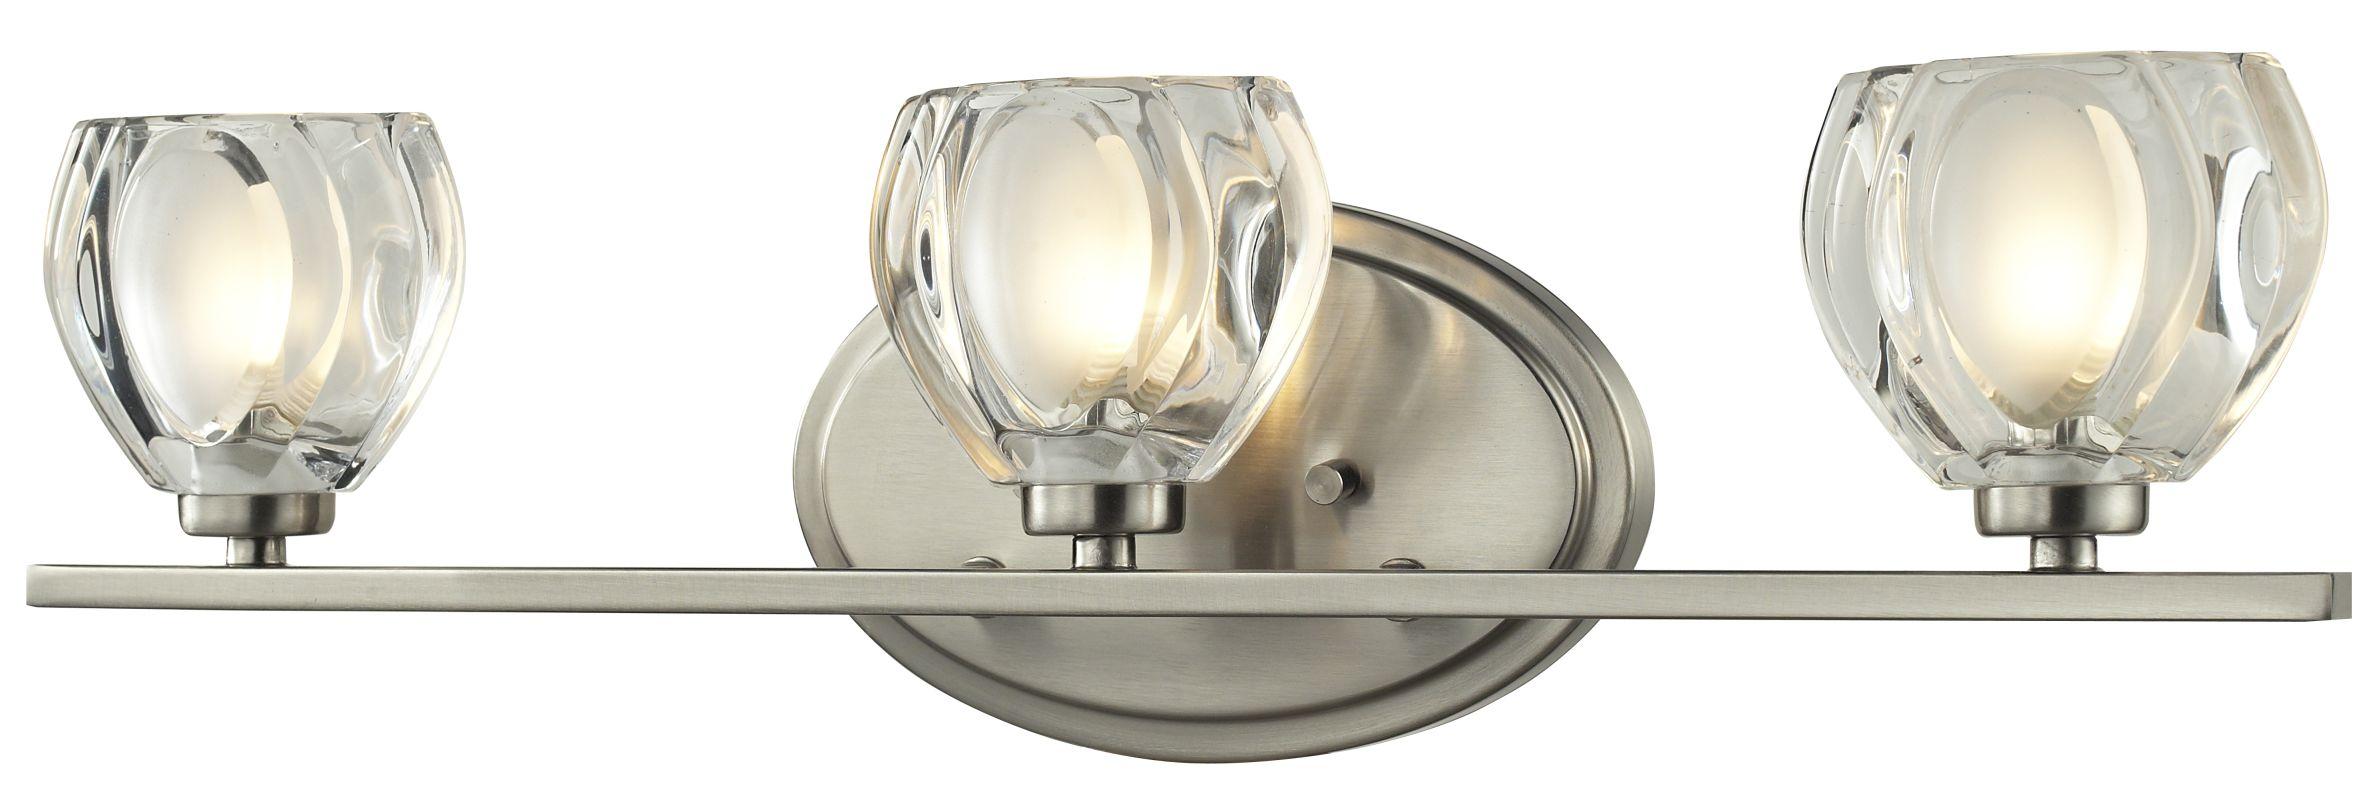 Z-Lite 3022-3V Hale 3 Light ADA Compliant Bathroom Vanity Light with